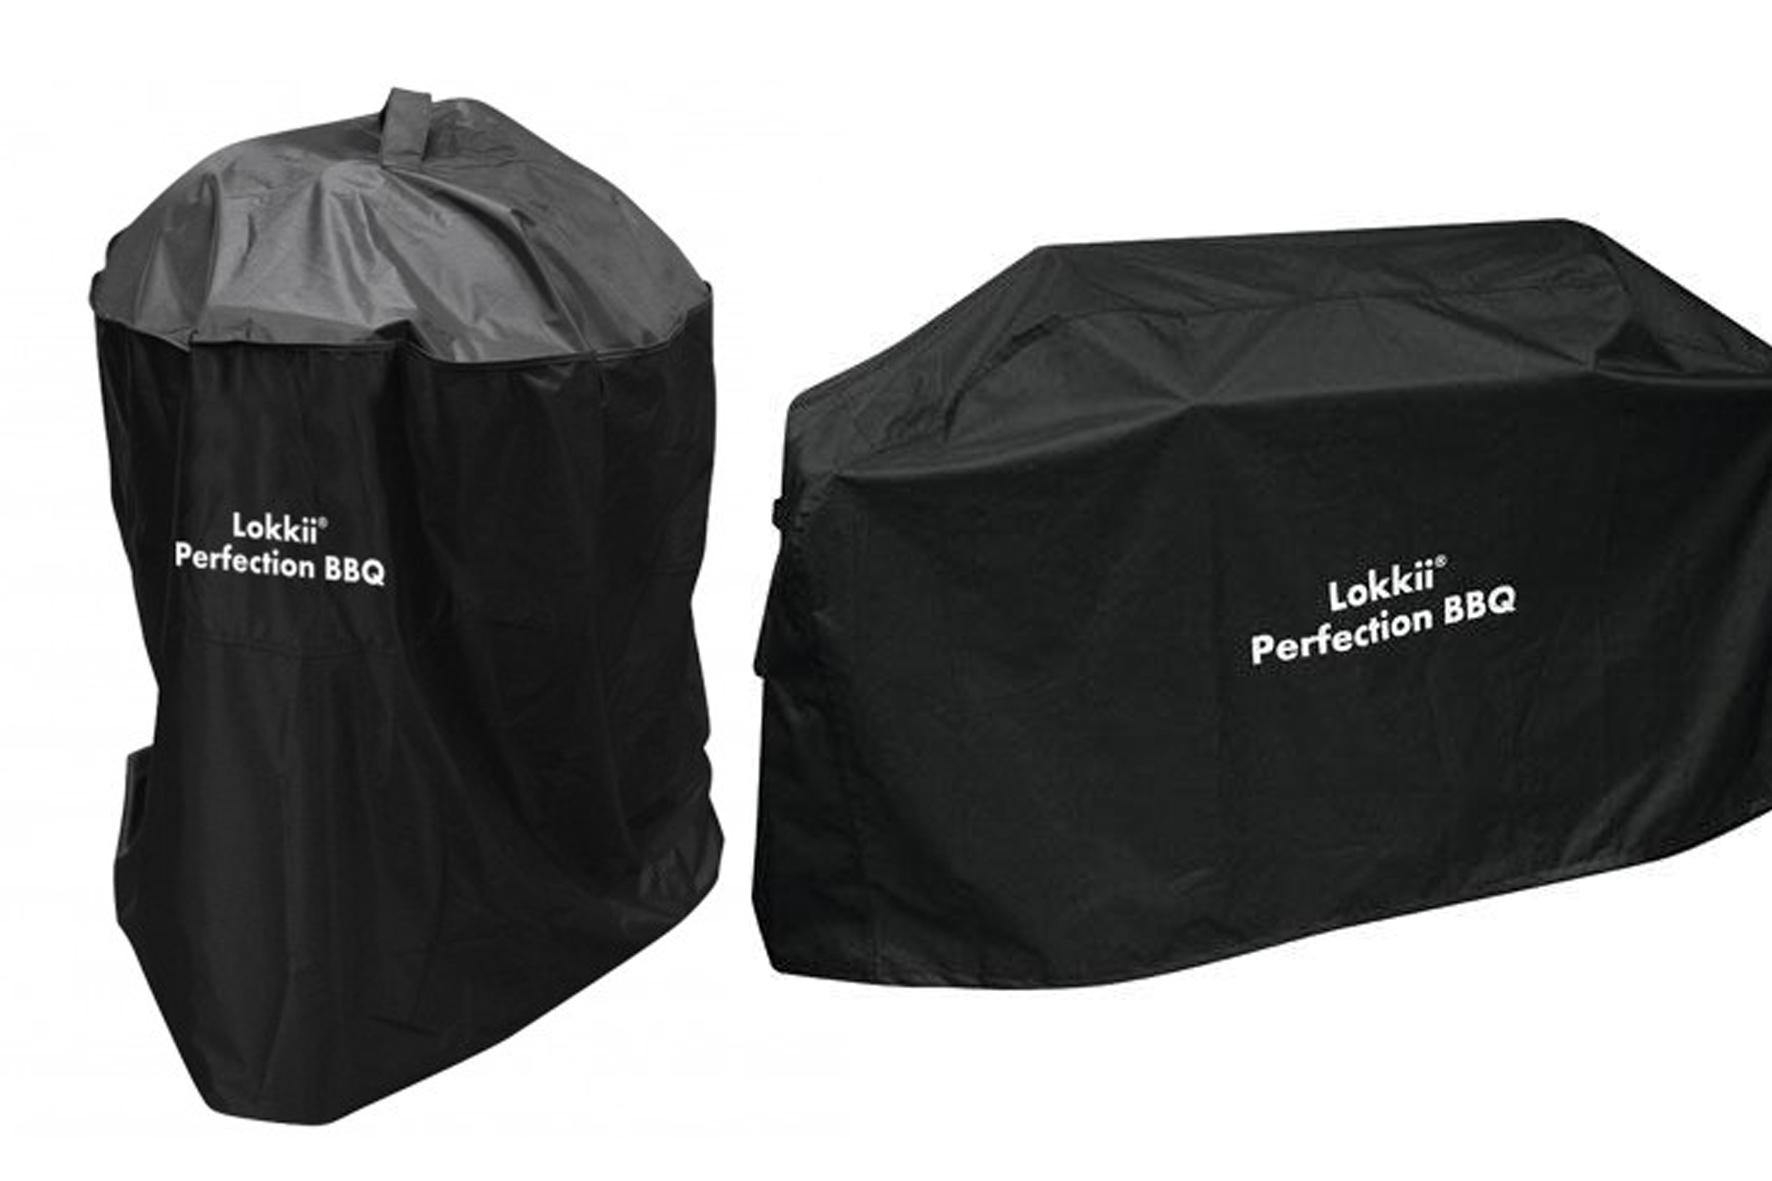 housse pour barbecue lokkii achat en ligne ou dans notre magasin. Black Bedroom Furniture Sets. Home Design Ideas